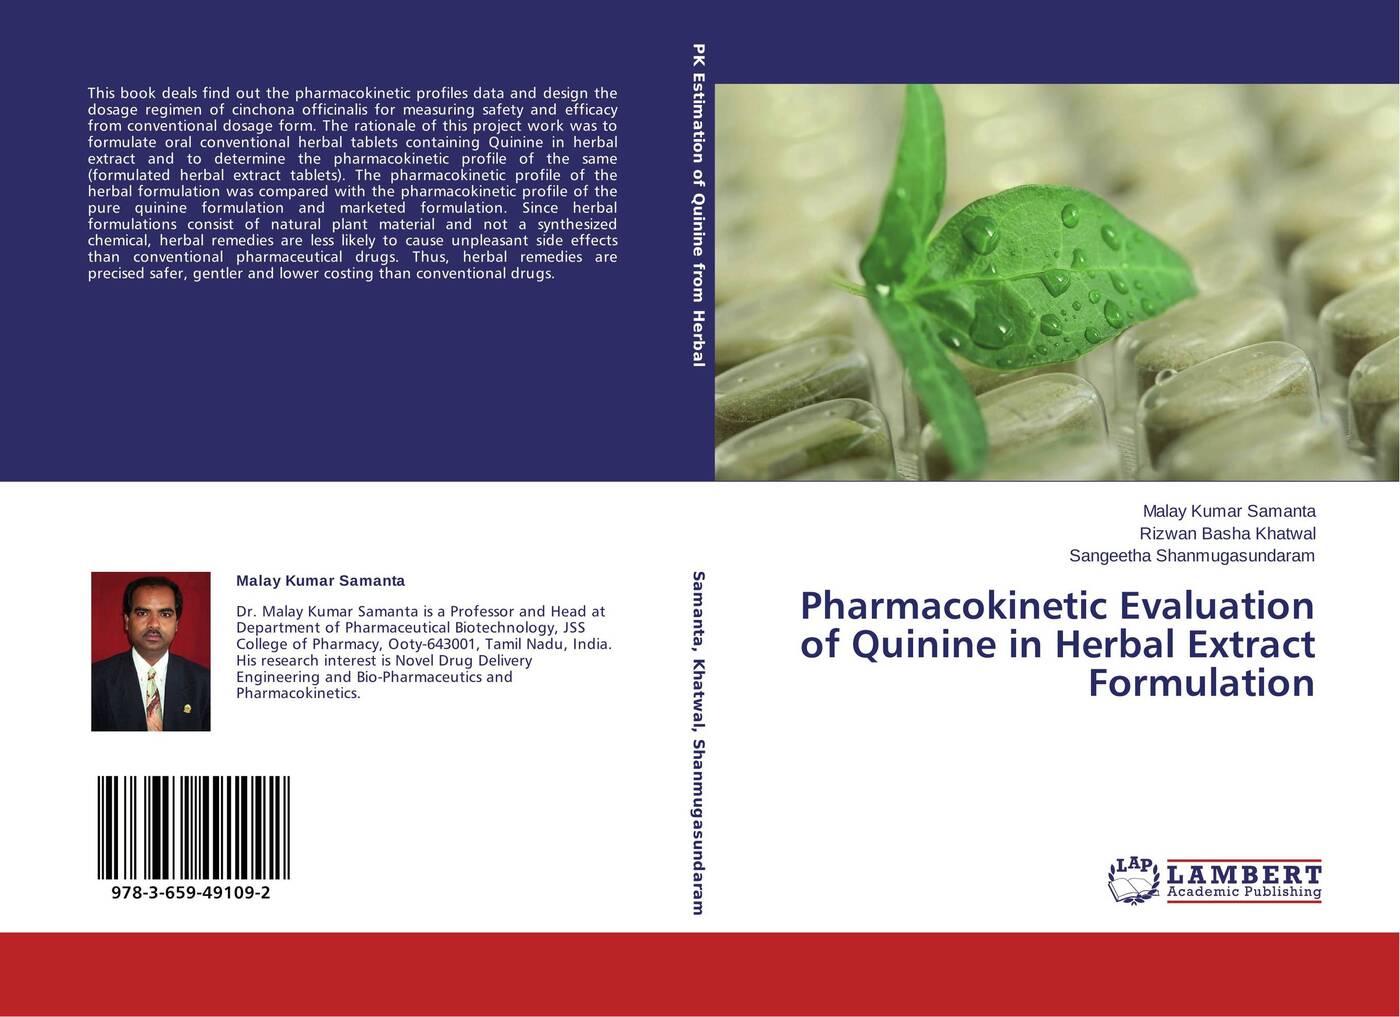 Malay Kumar Samanta,Rizwan Basha Khatwal and Sangeetha Shanmugasundaram Pharmacokinetic Evaluation of Quinine in Herbal Extract Formulation стоимость